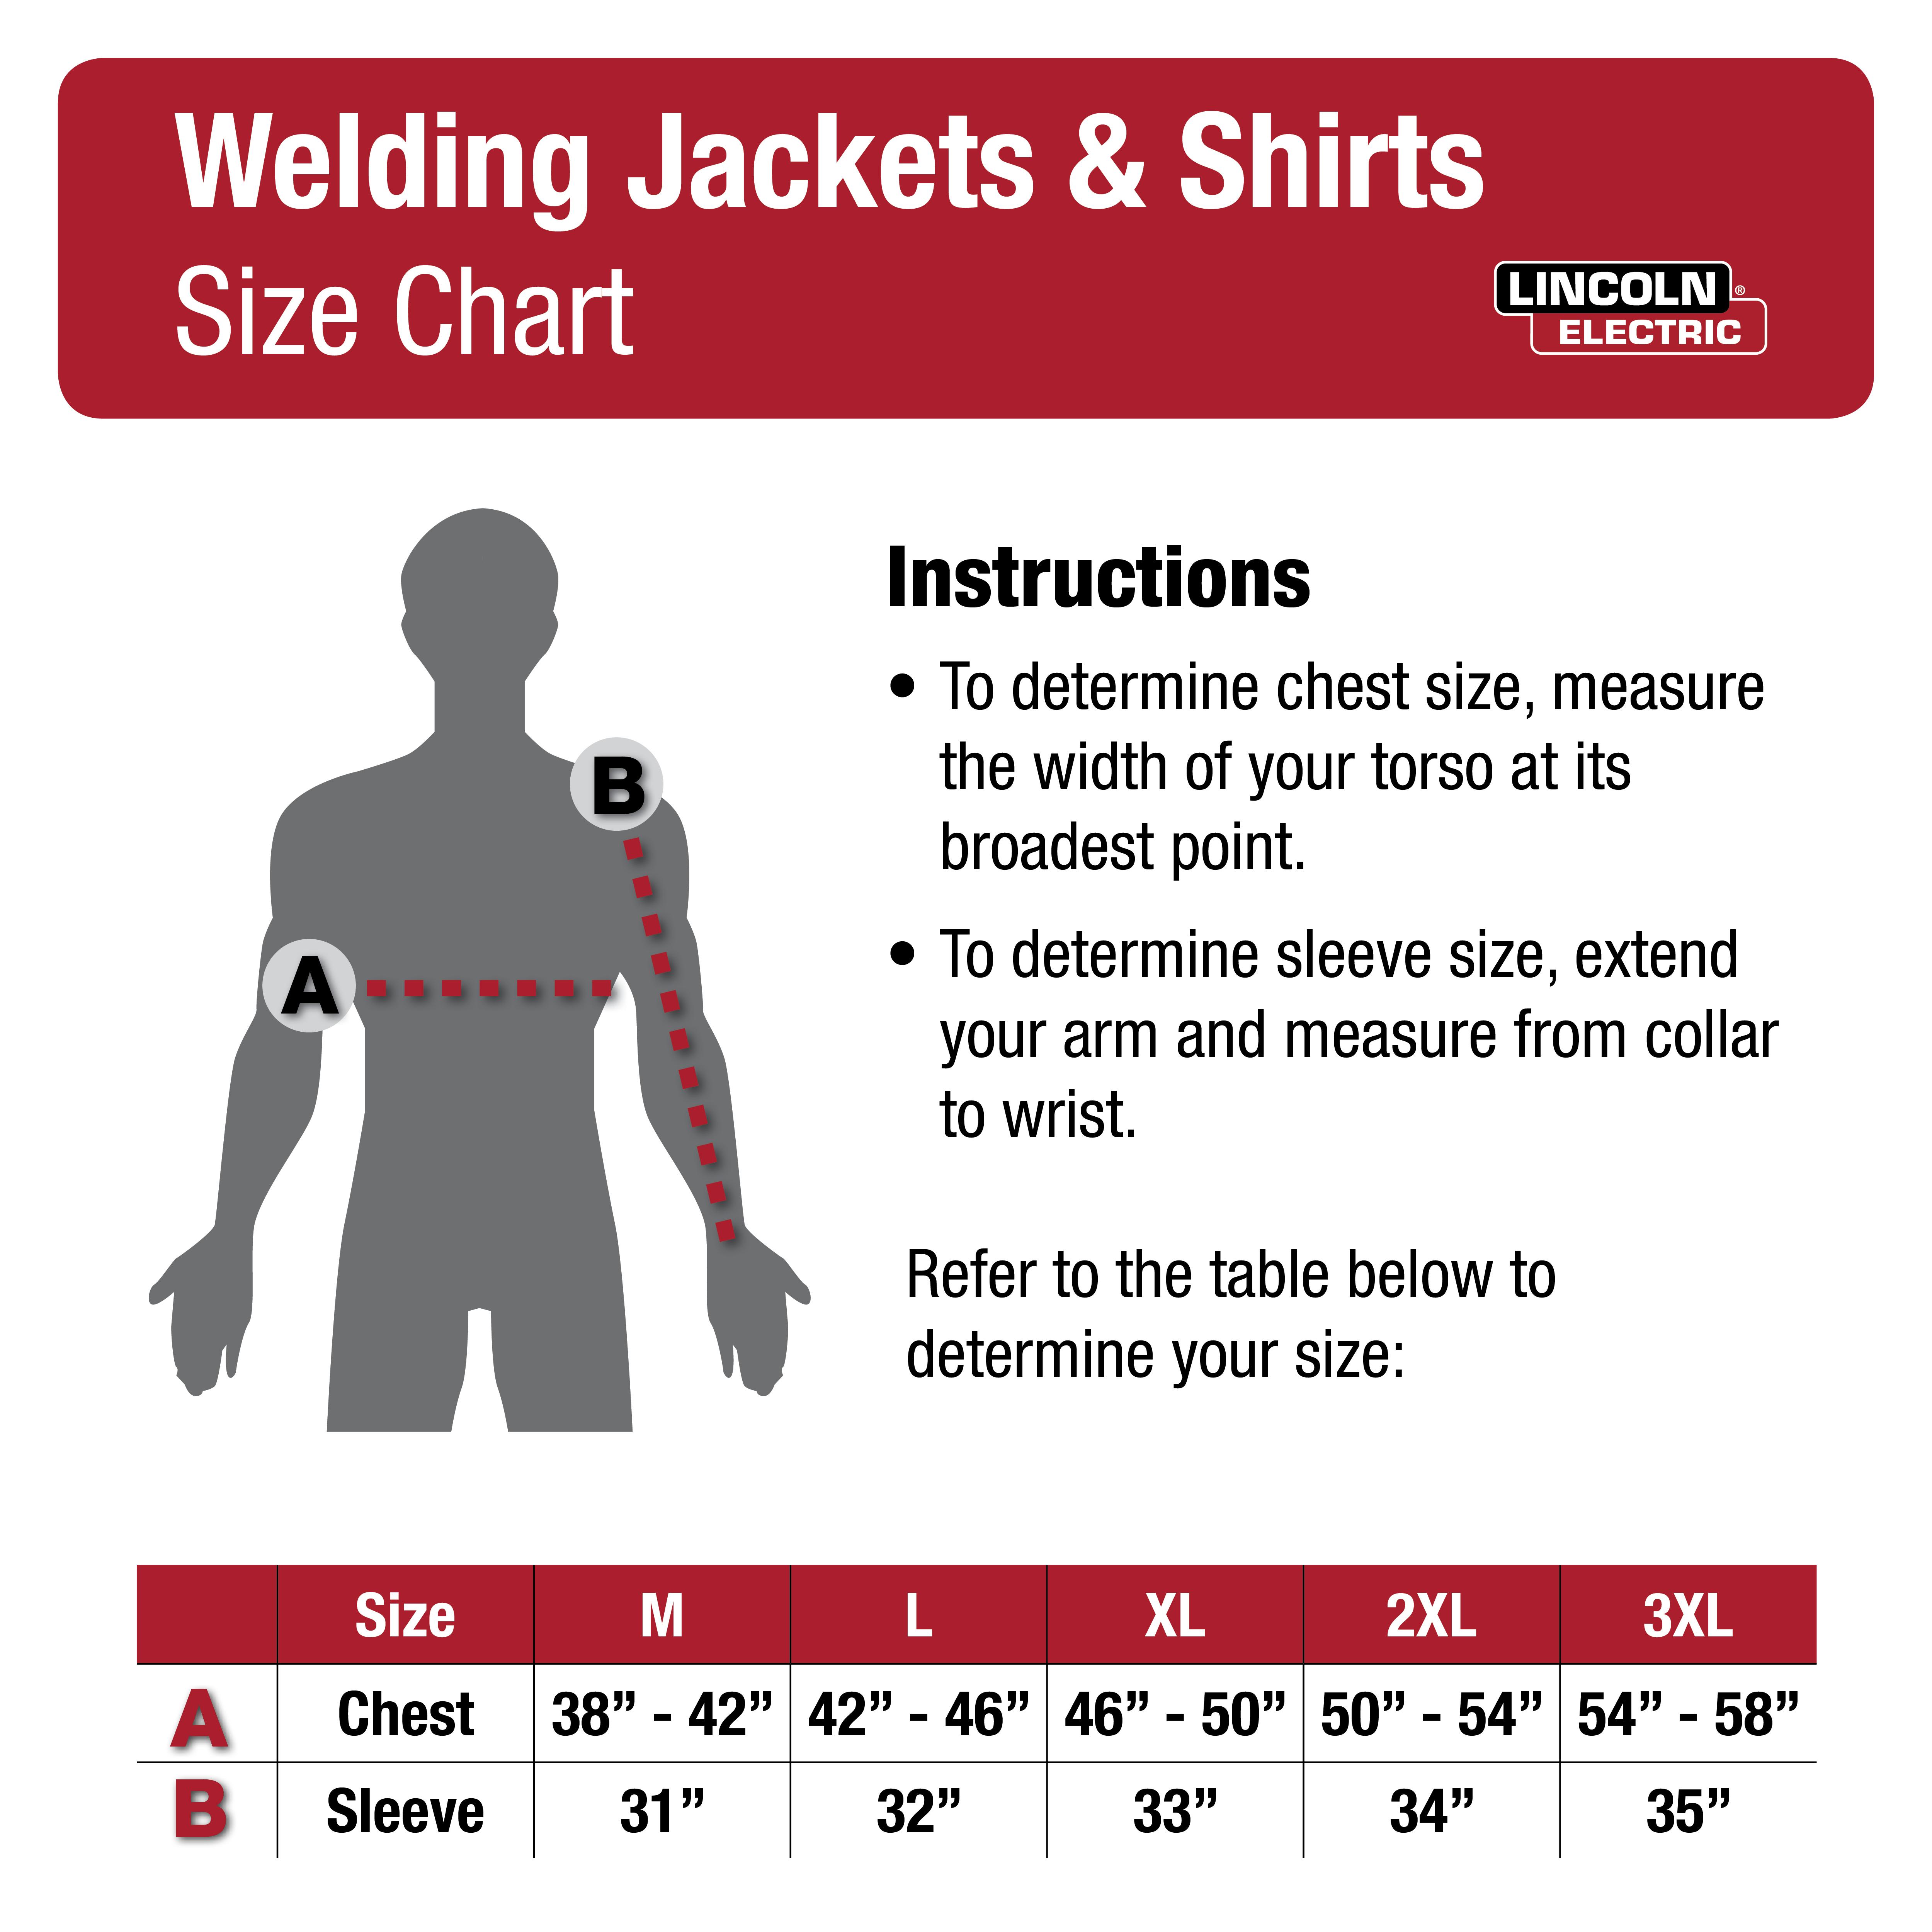 Welding Jackets & Shirts Size Chart